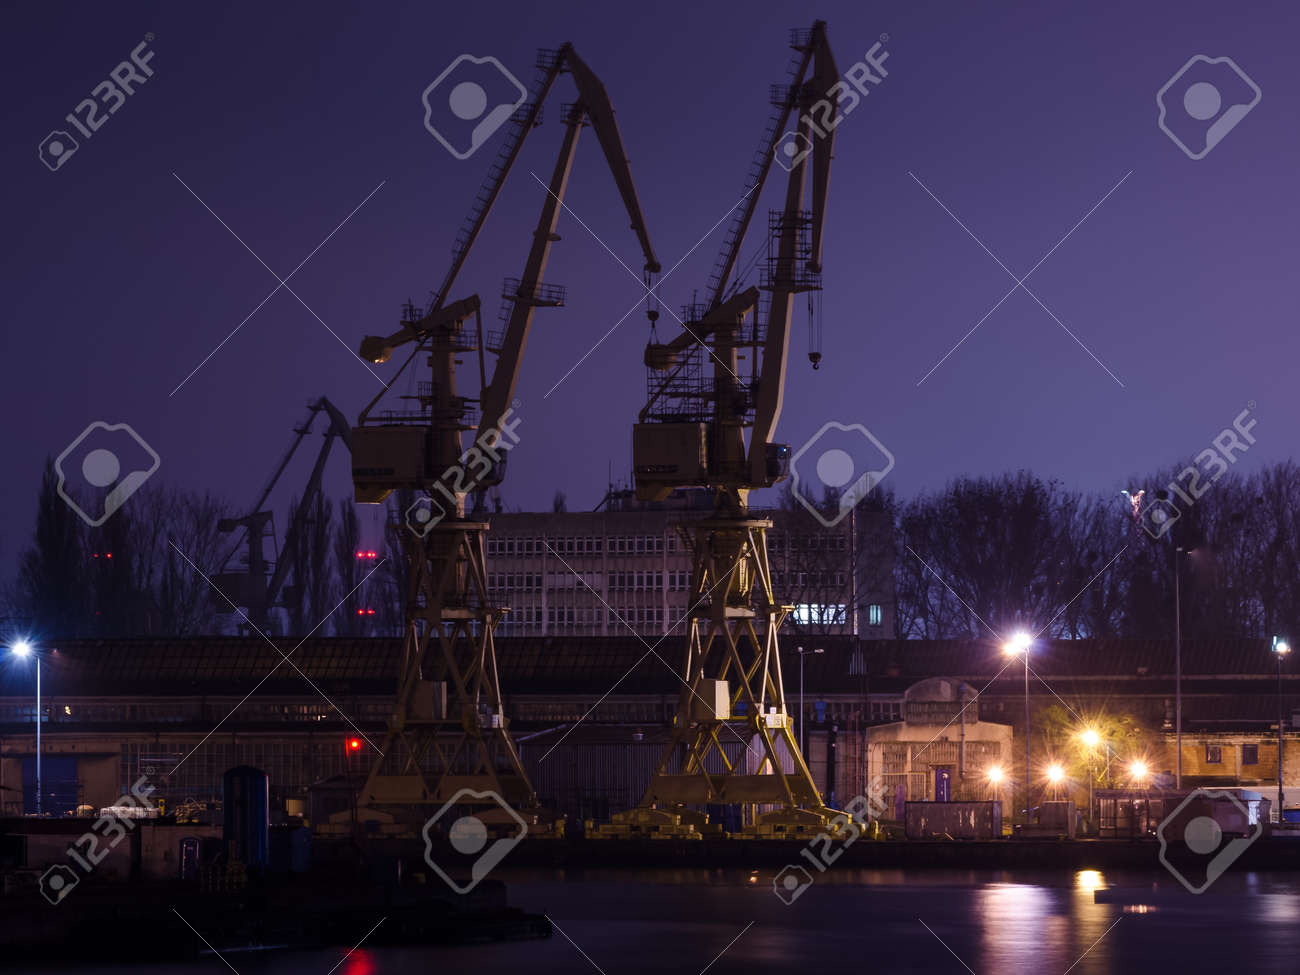 SZCZECIN, WEST POMERANIAN - POLAND - 2020: Shipyard cranes and quays at night - 168633088